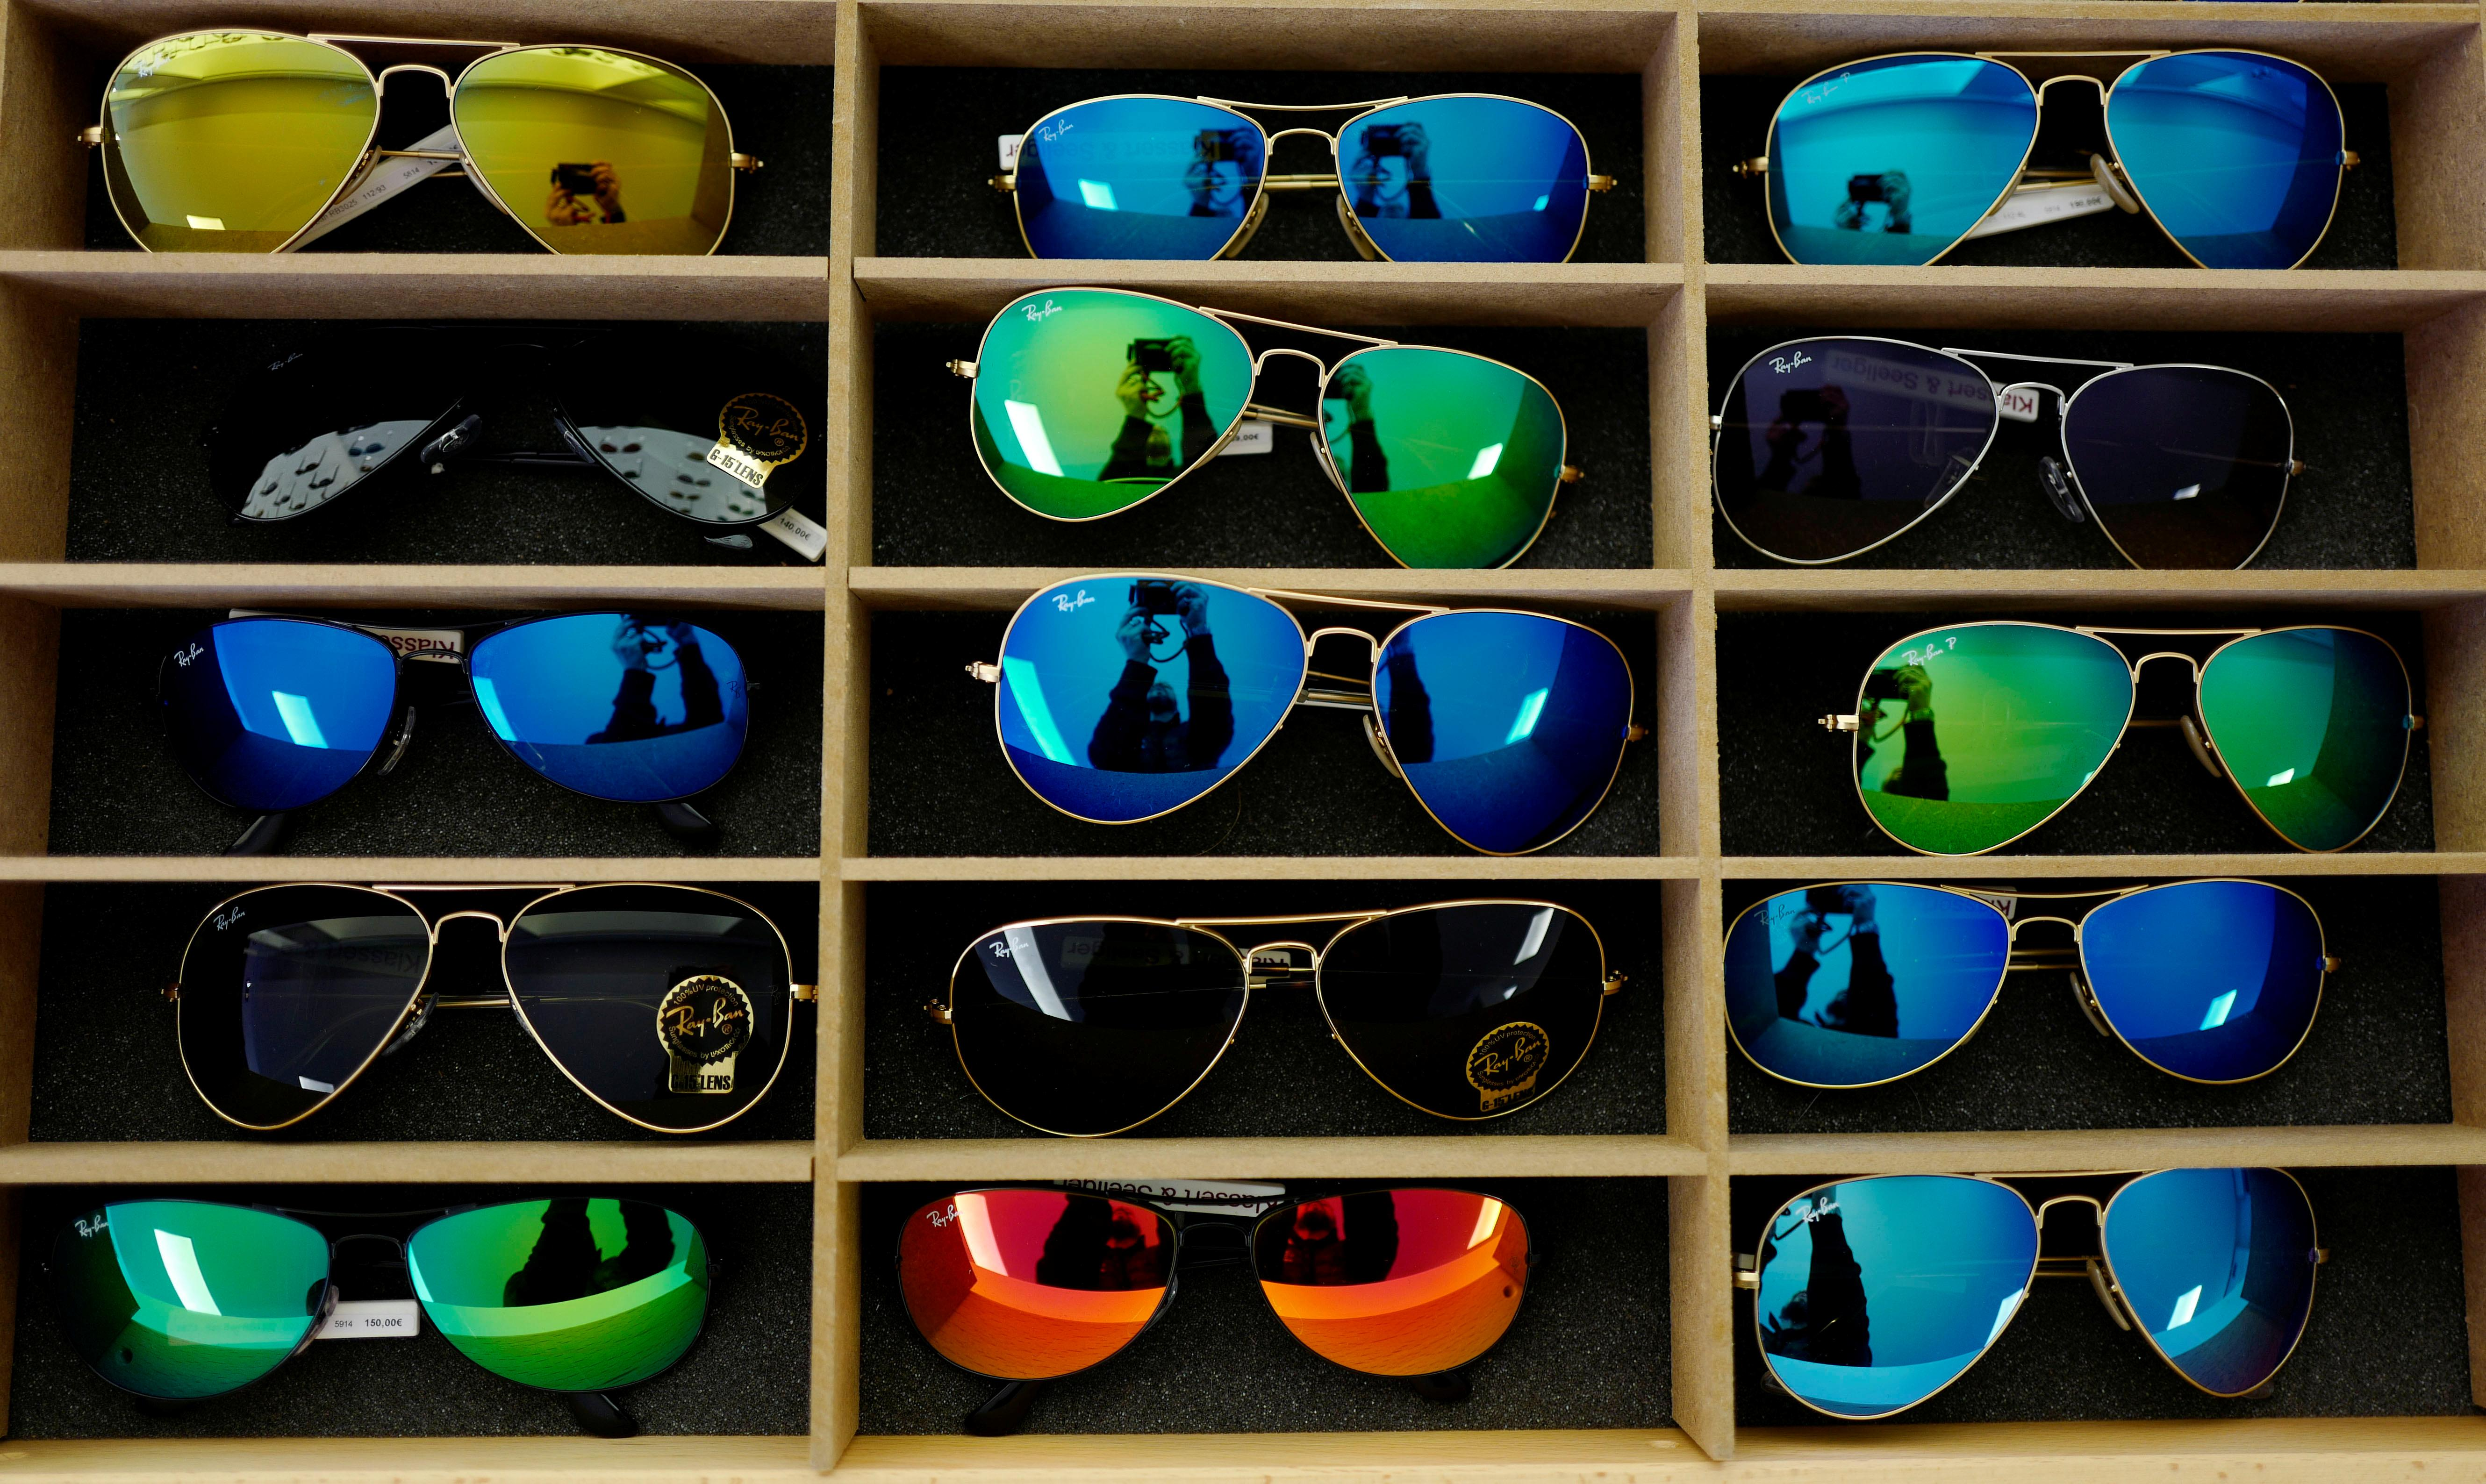 ray ban sunglasses shops near me